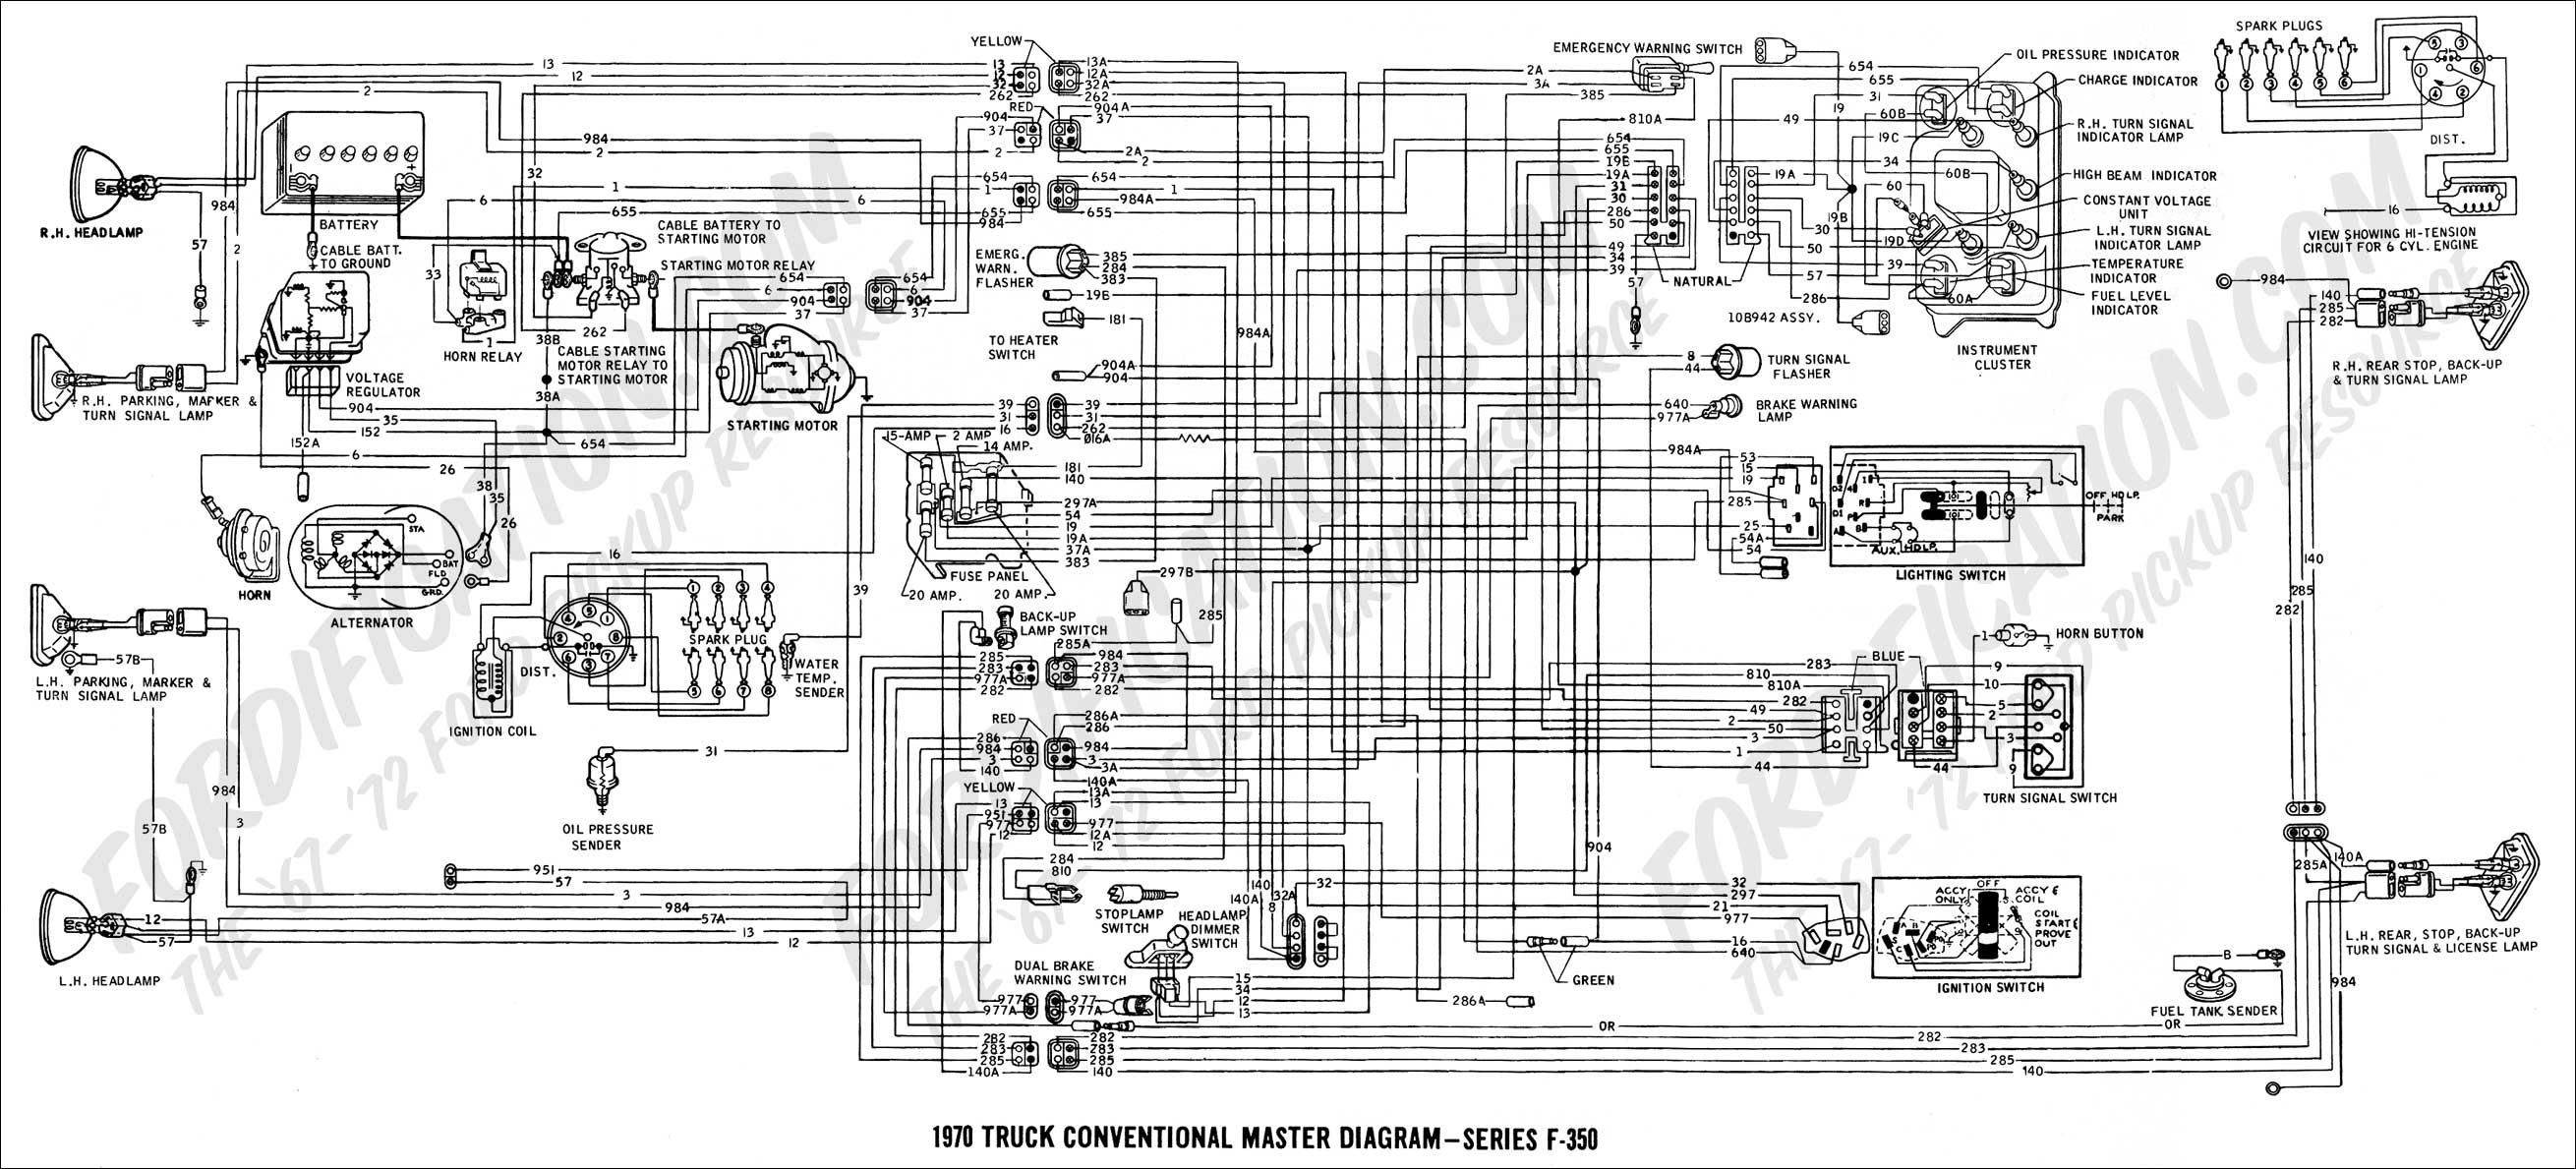 [DIAGRAM_5NL]  2005 Ford E350 Wiring Diagram - Jeep Cj5 Ignition Wiring for Wiring Diagram  Schematics | 2005 F250 Wiring Diagram |  | Wiring Diagram Schematics